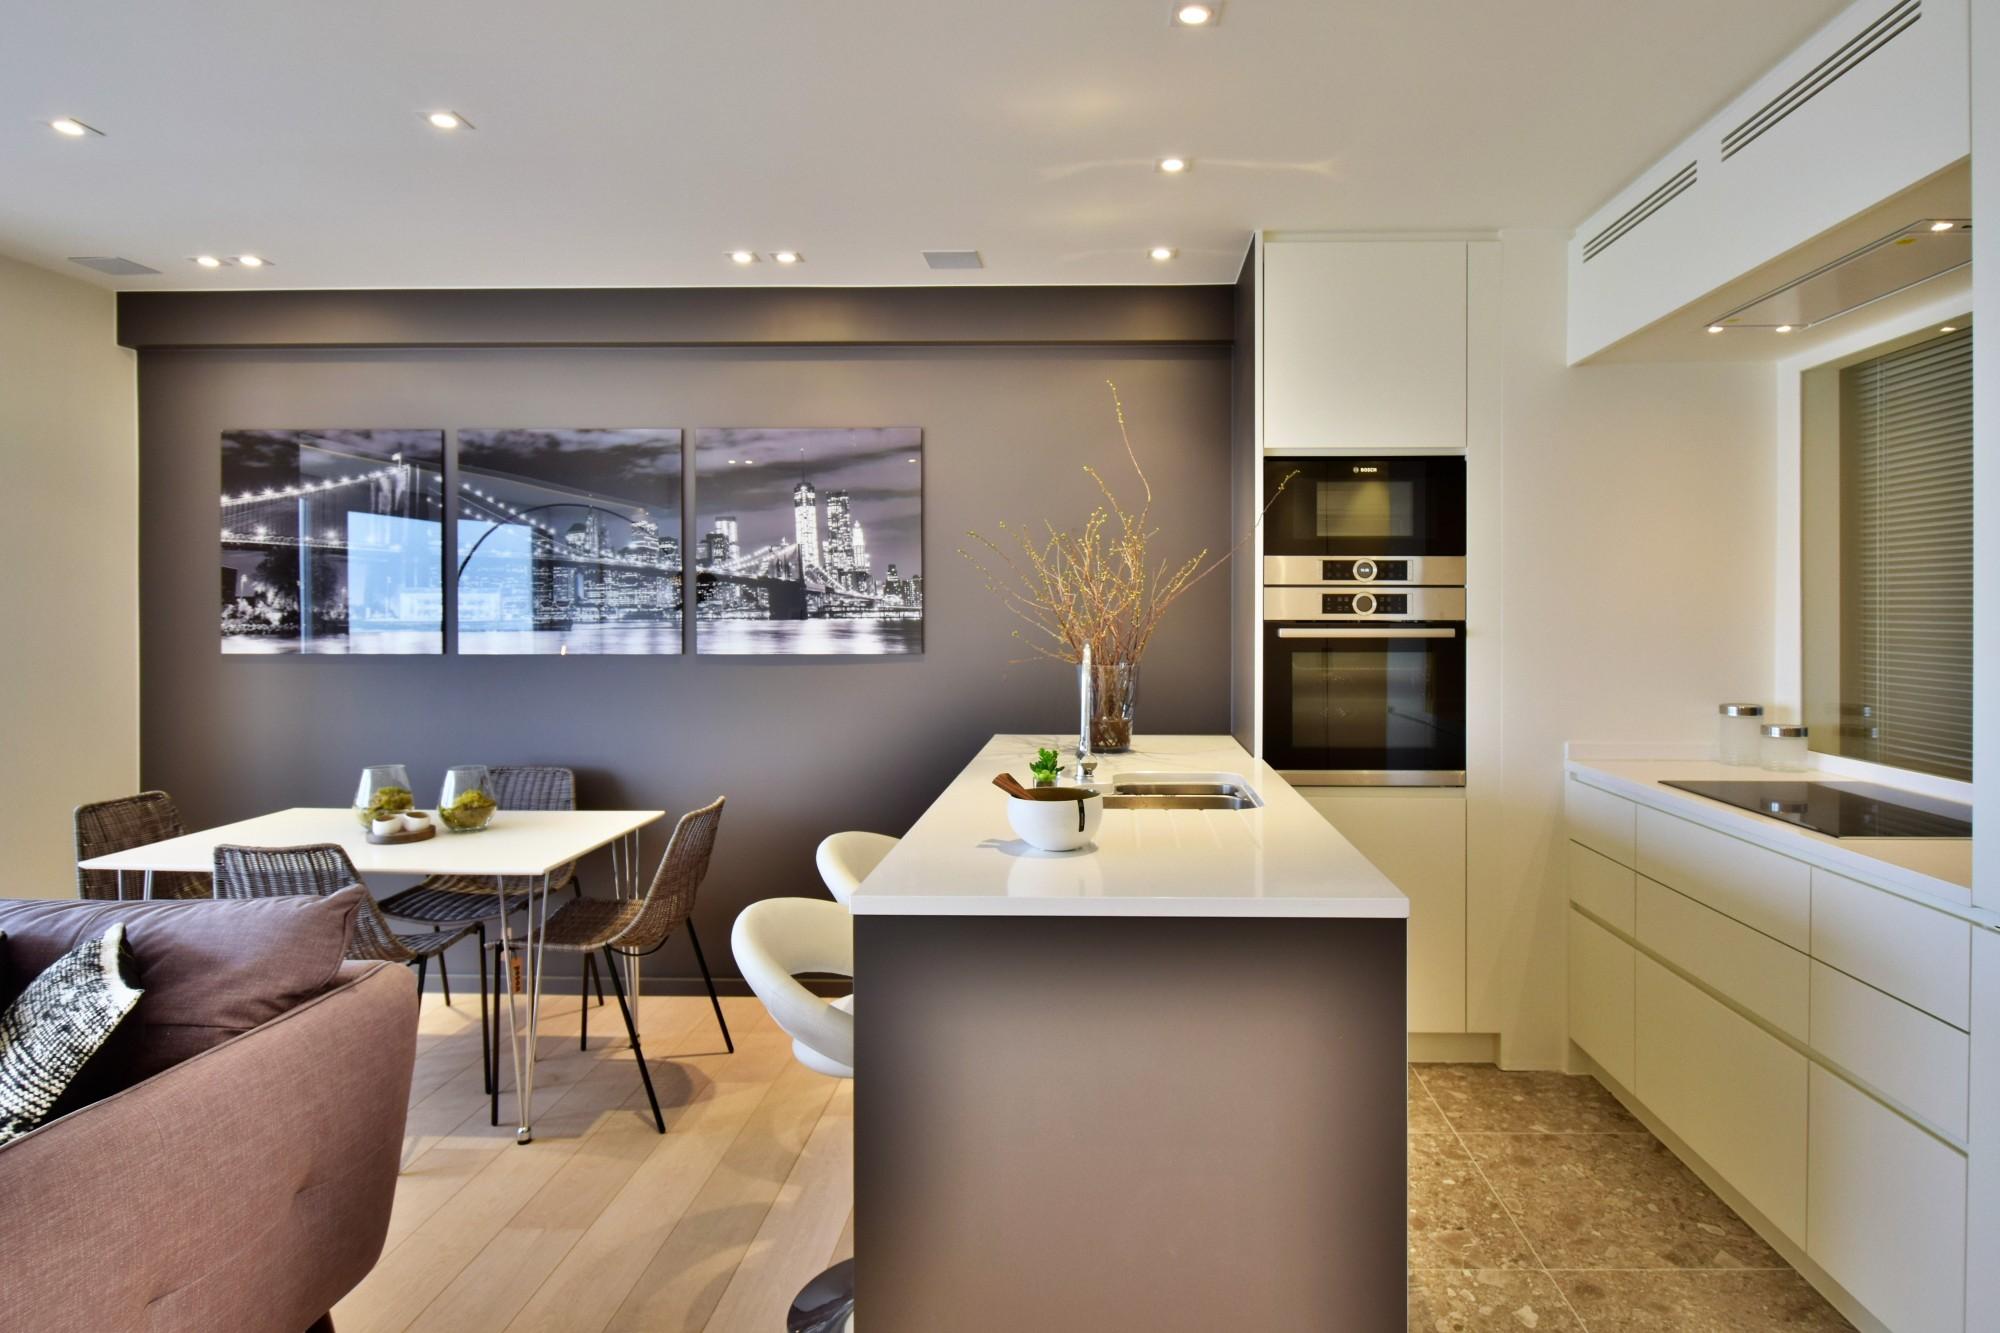 Vente Appartement 3 CH Knokke-Heist - Digue de mer / Place Rubens